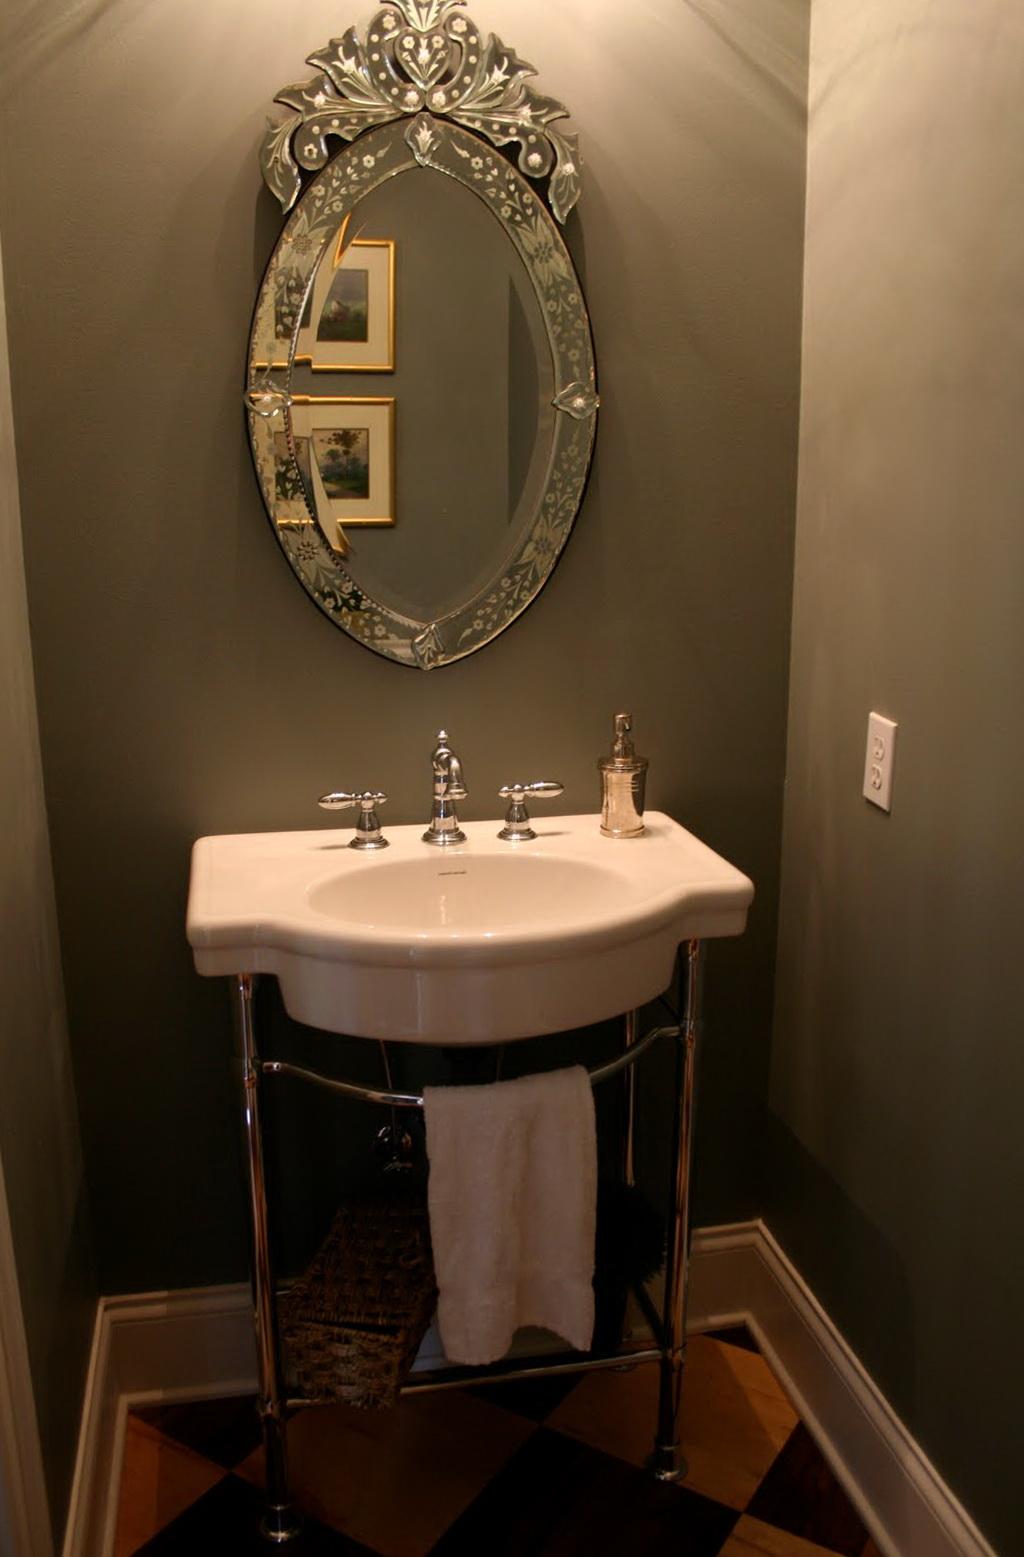 Decorative Powder Room Mirrors Home Design Ideas